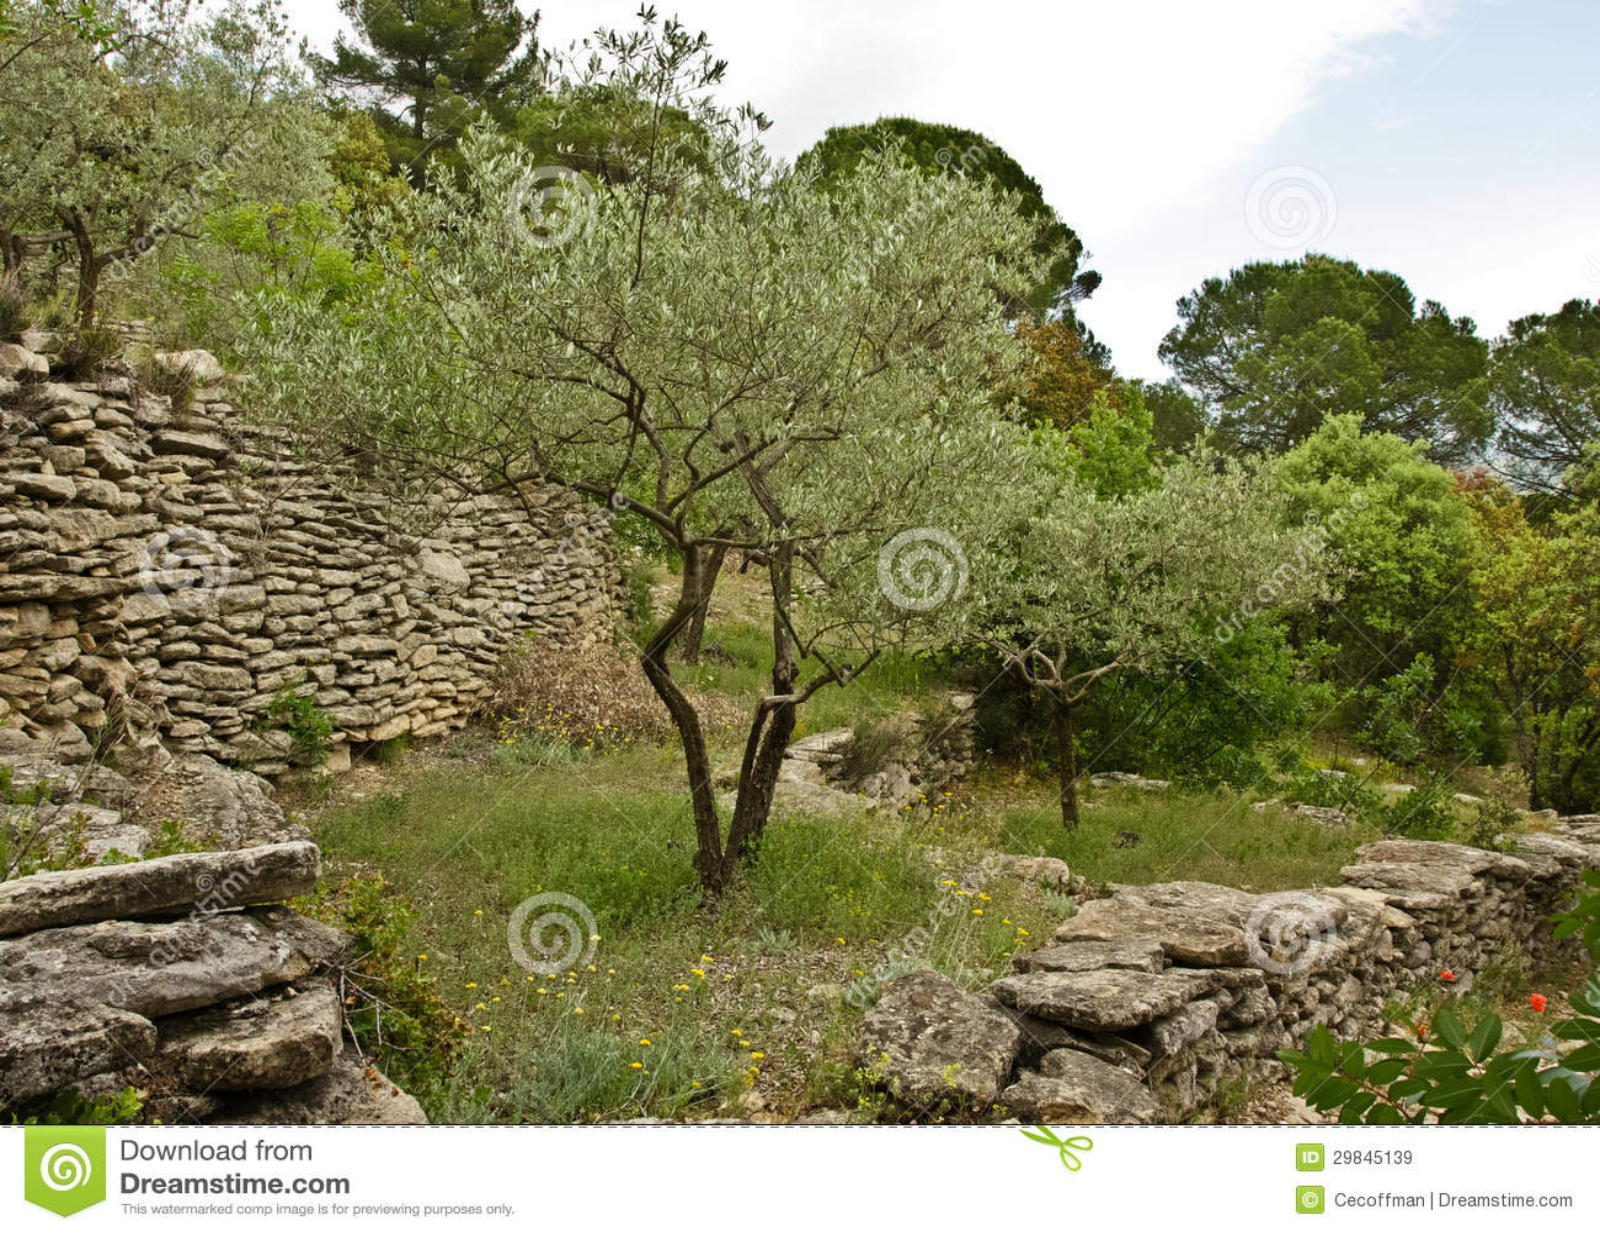 olivenbaum im garten lizenzfreie stockbilder bild 29845139. Black Bedroom Furniture Sets. Home Design Ideas